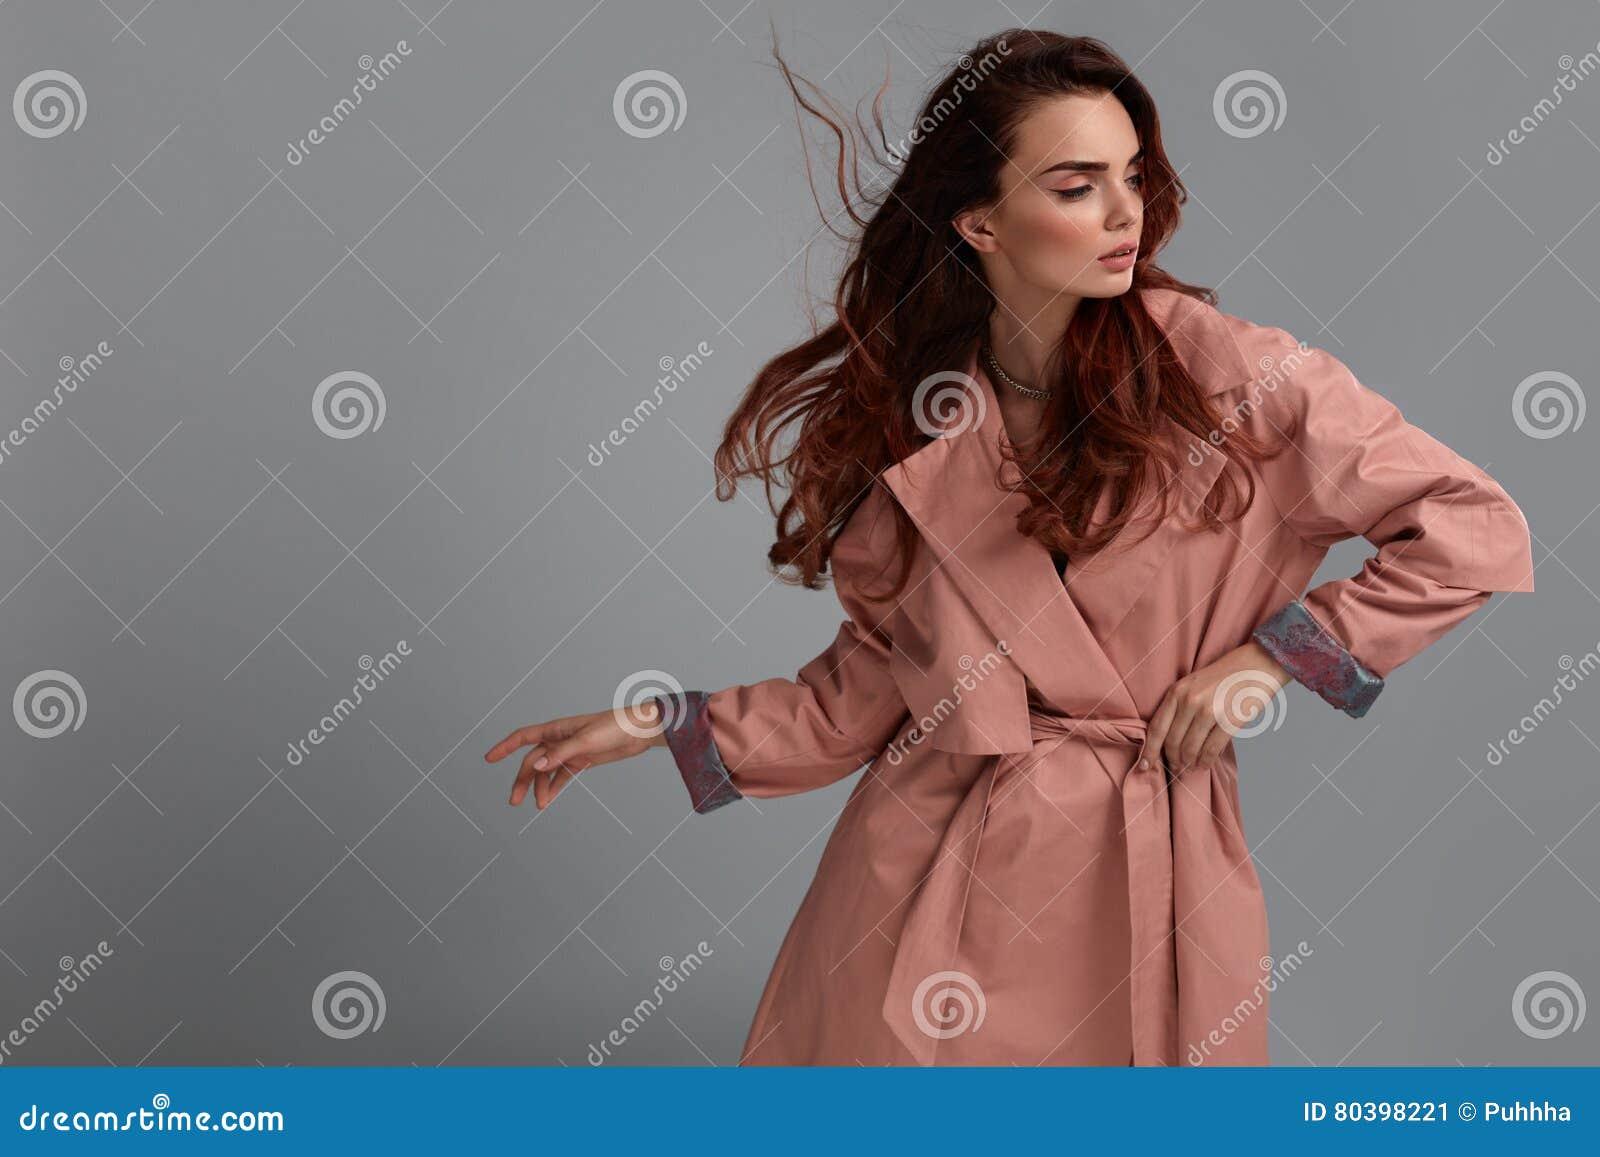 Ropa de Girl Wearing Fashionable del modelo de moda en estudio estilo